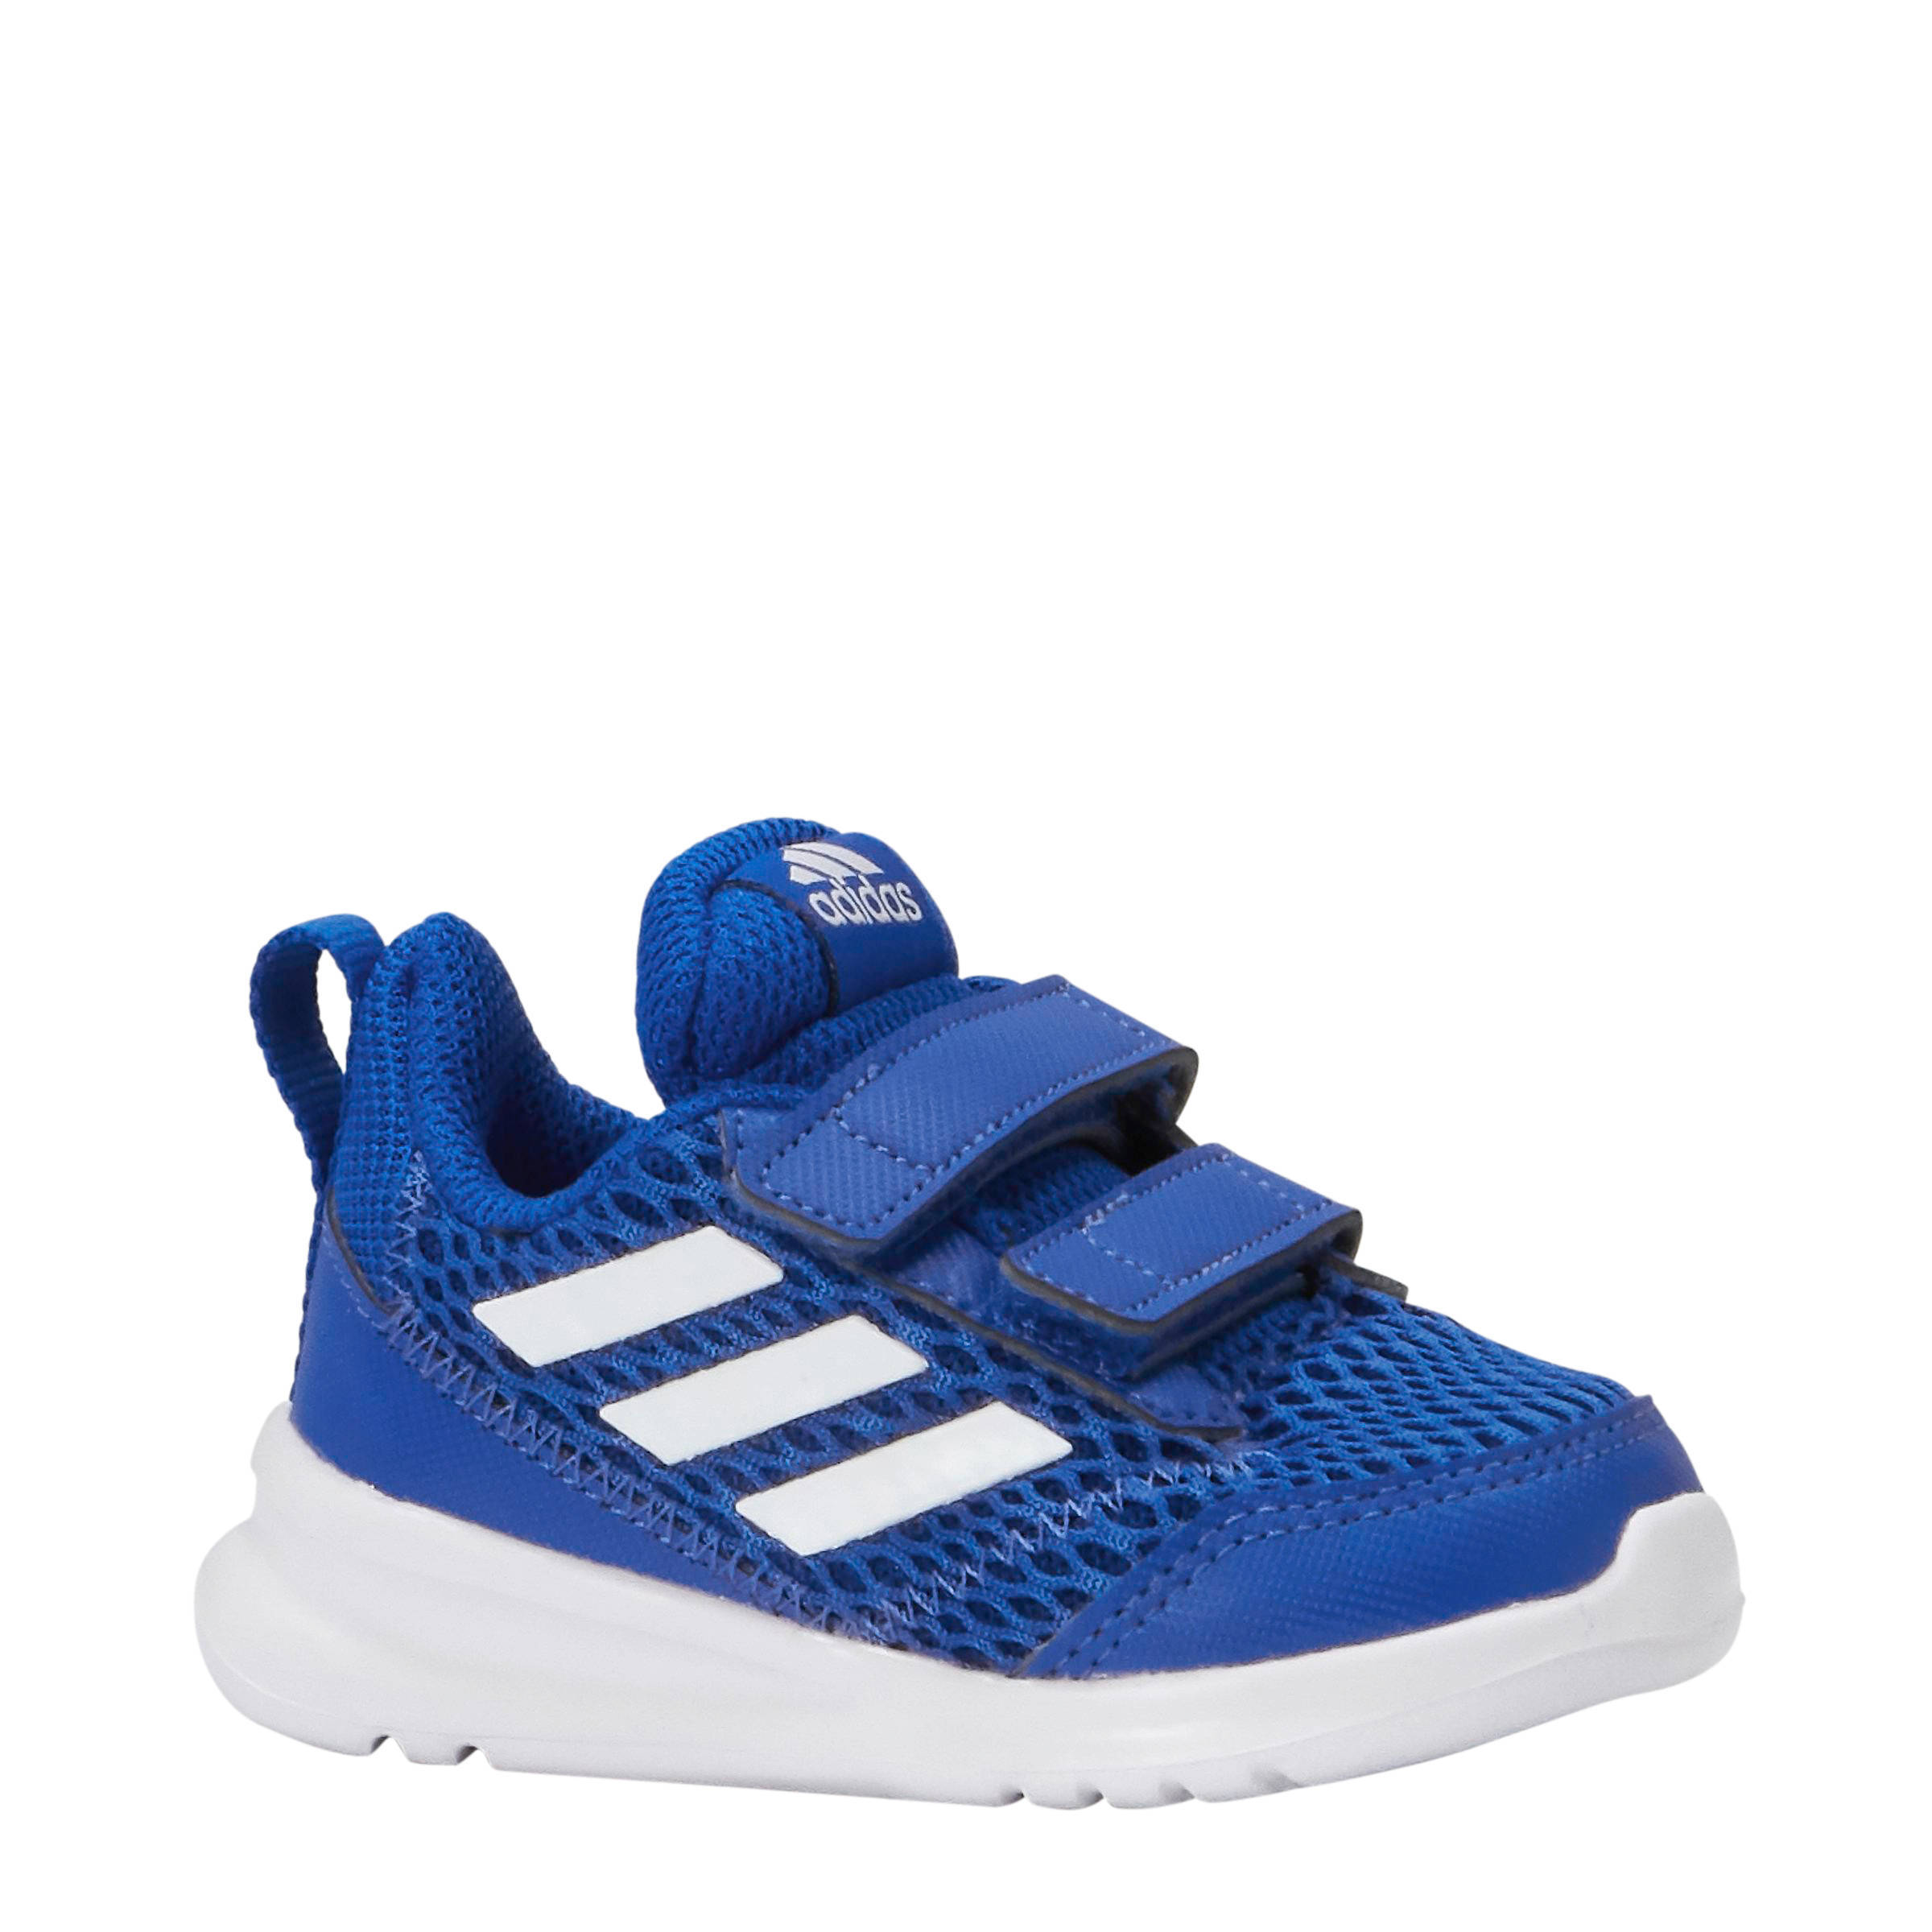 adidas Performance AltaRun CF I sportschoenen kobaltblauw